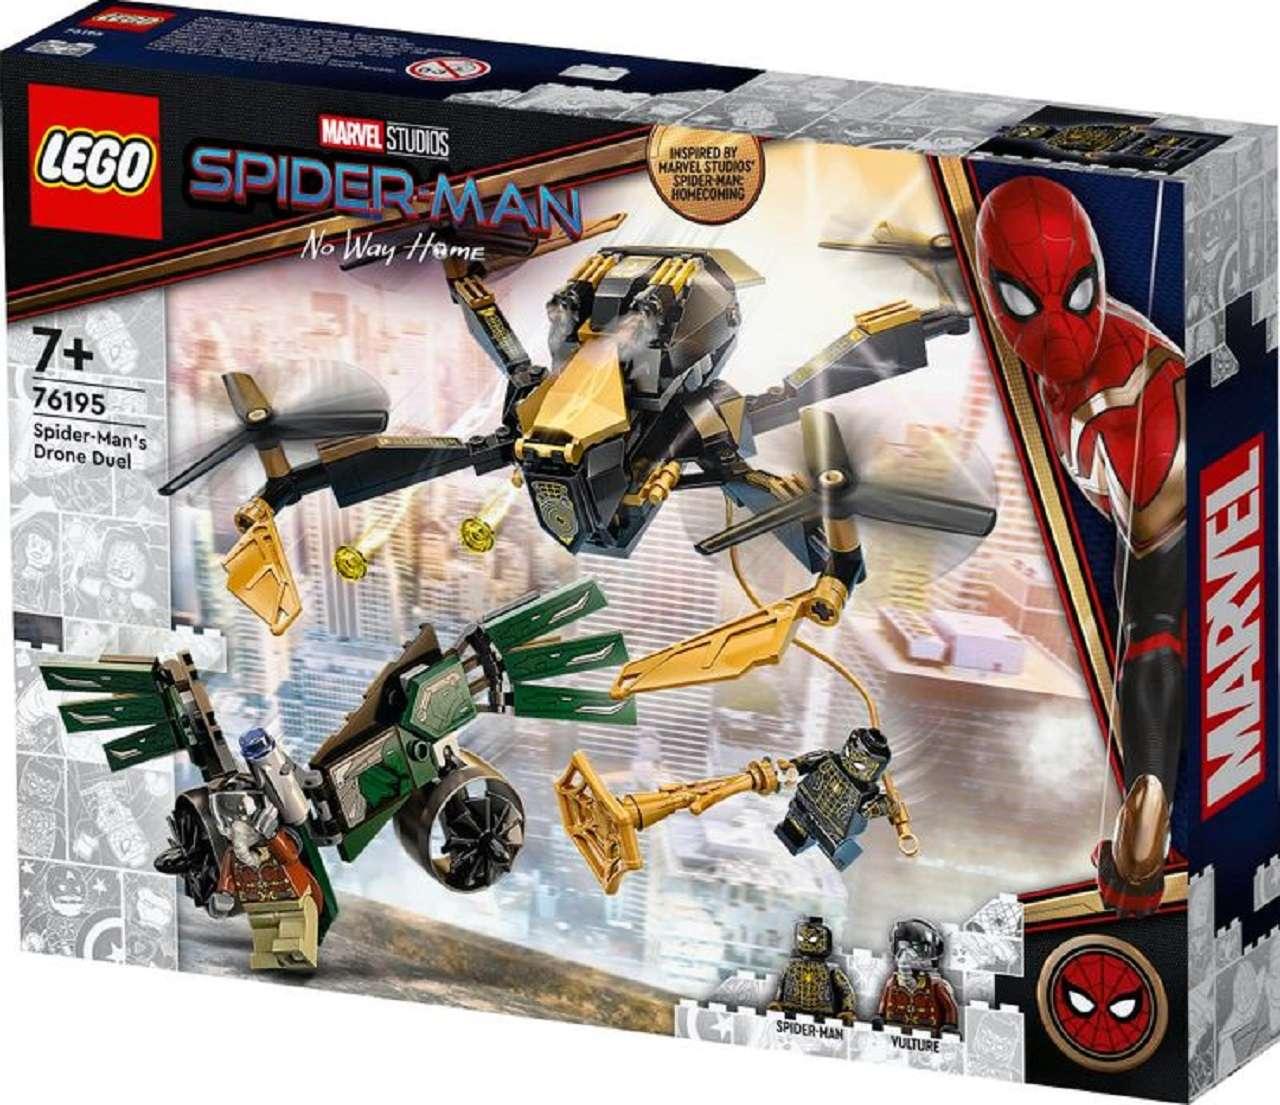 Vulture Spider-Man No Way Home Lego Spiderman